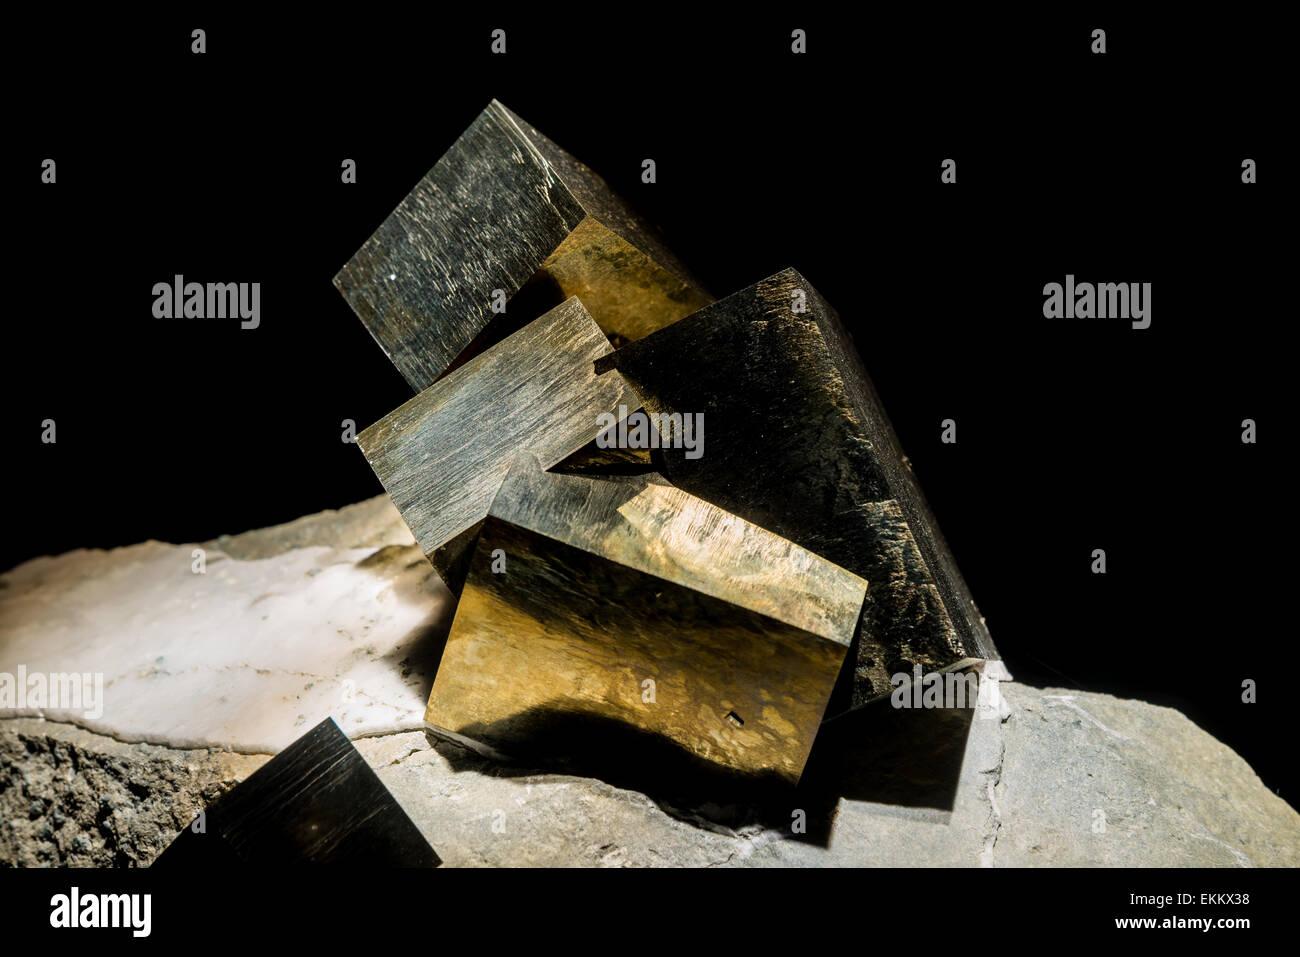 Cubo Di Ferro.A Forma Di Cubo Di Pirite Minerale Il Solfuro Di Ferro